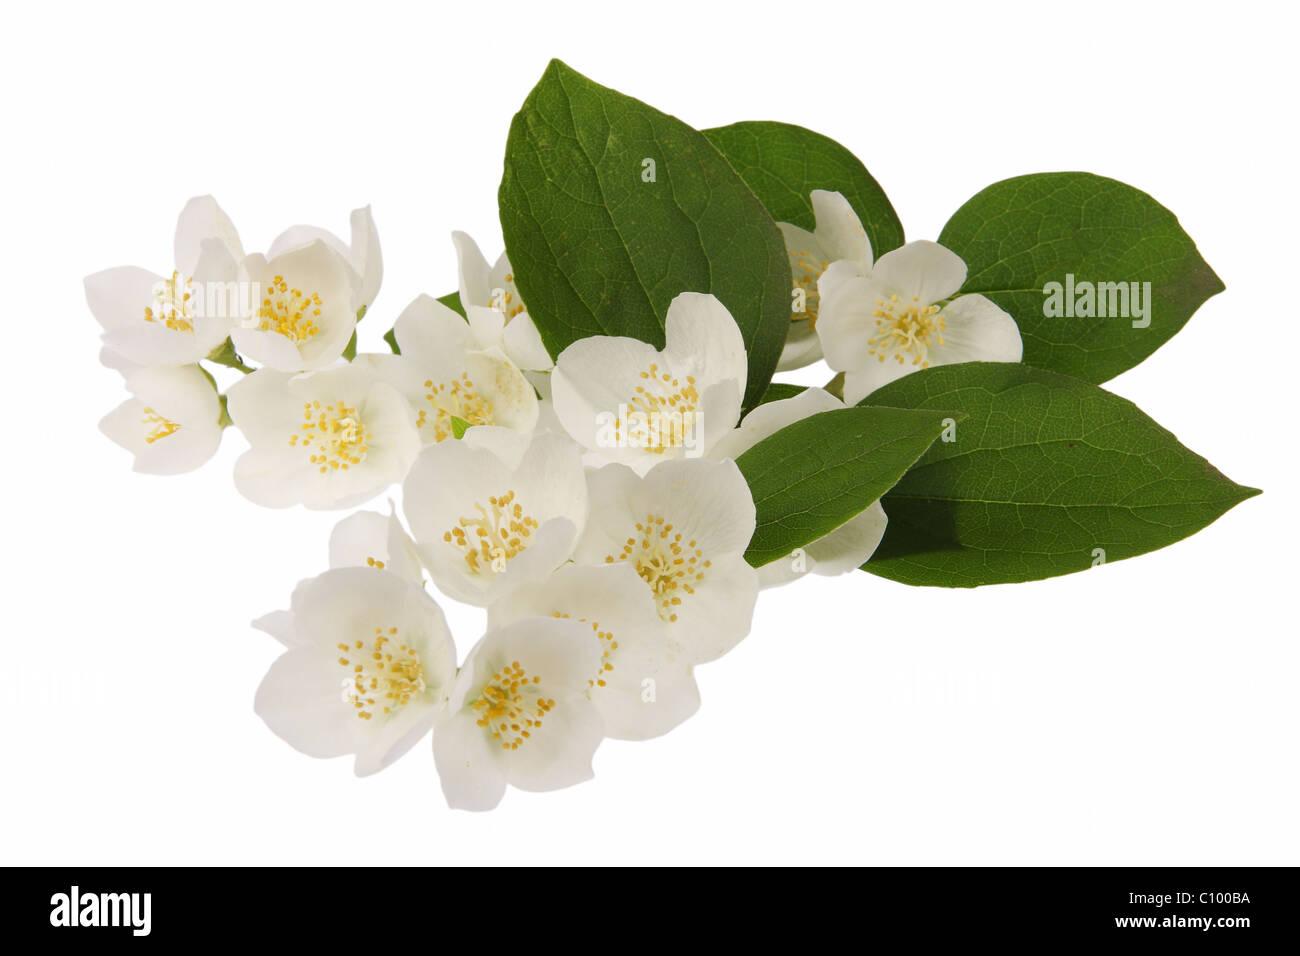 Jasmine flowers - Stock Image